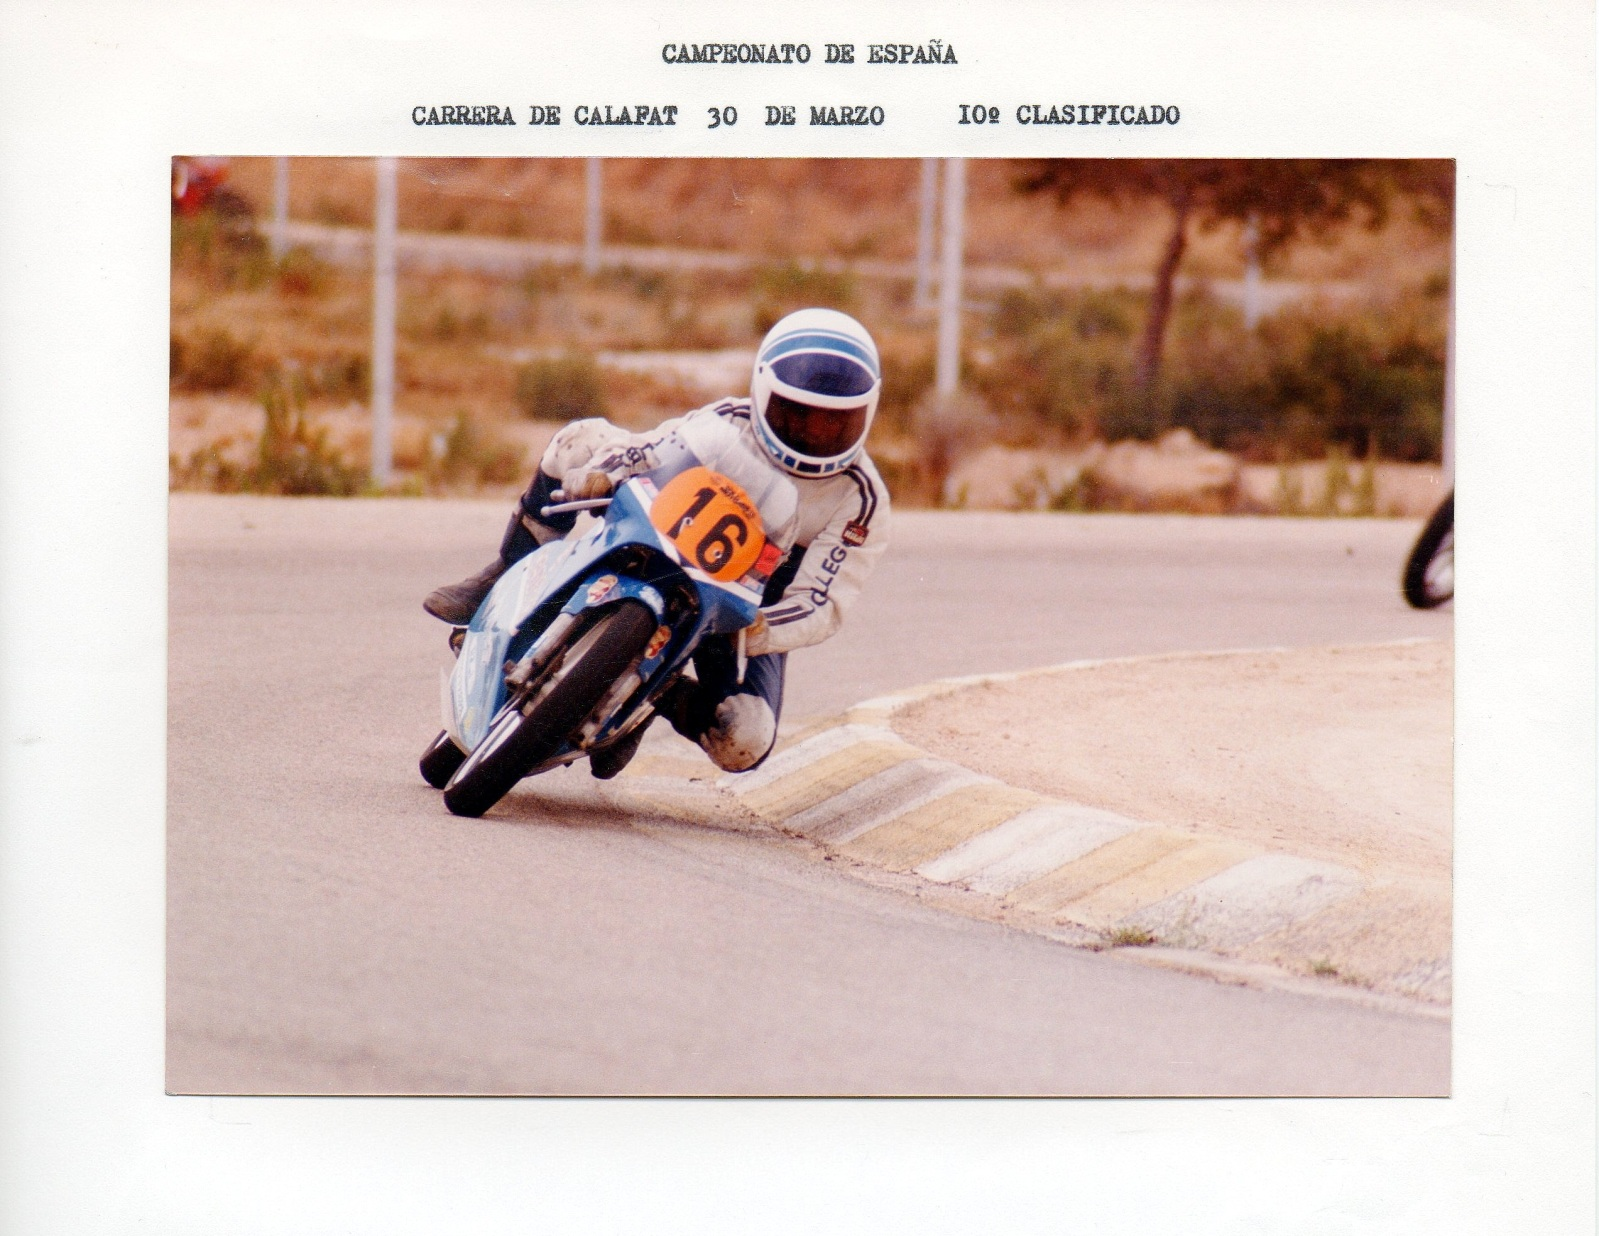 gilera - Antiguos pilotos: José Luis Gallego (V) Bg79t1